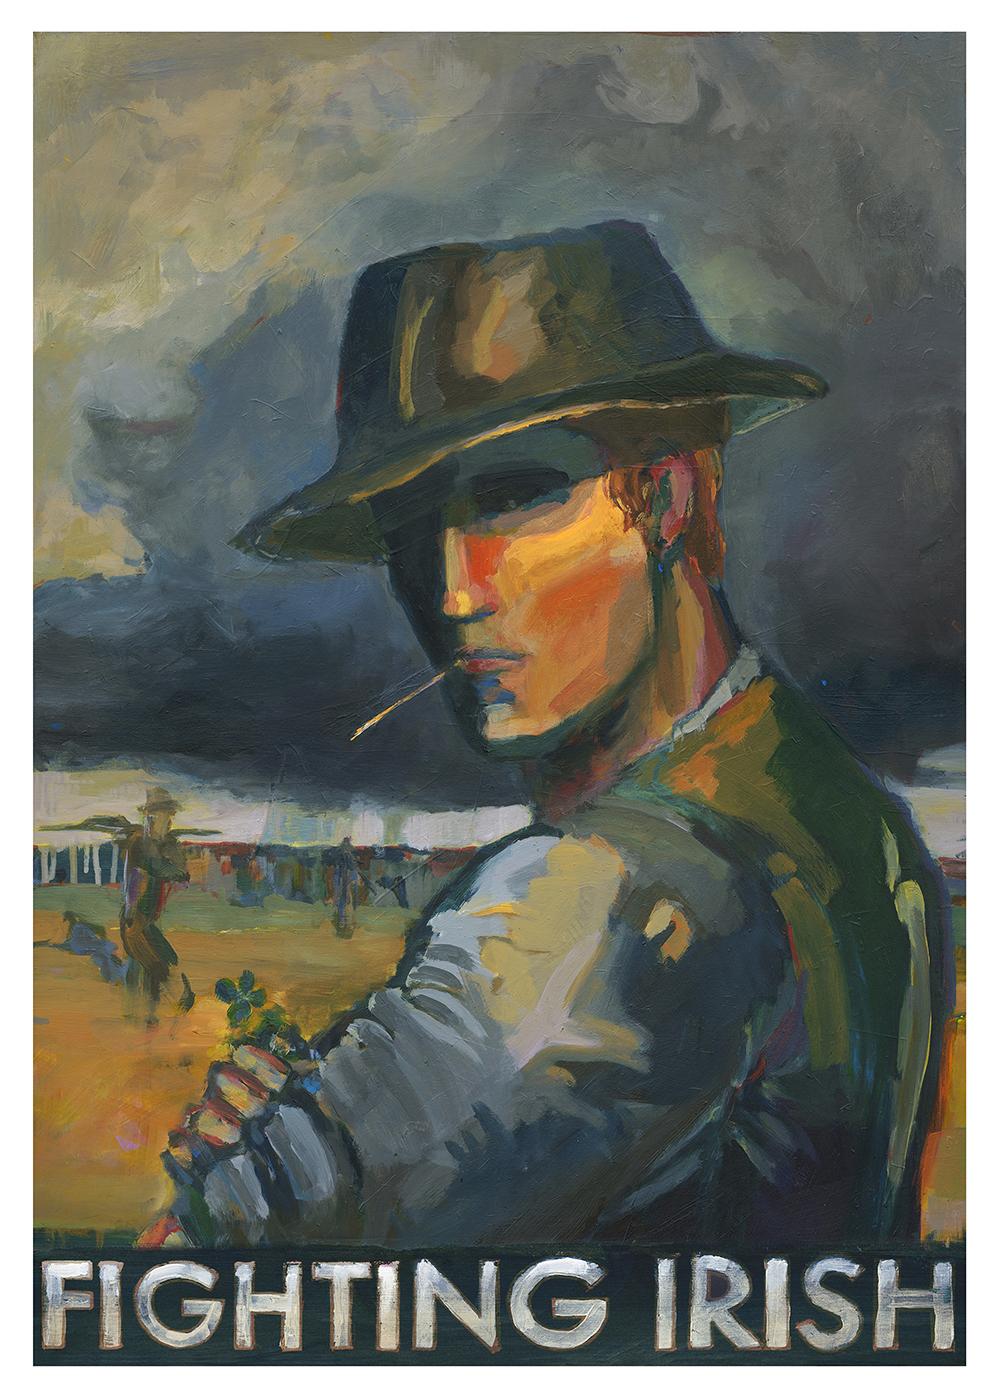 Fighting Irish Through the Storm, Revere La Noue